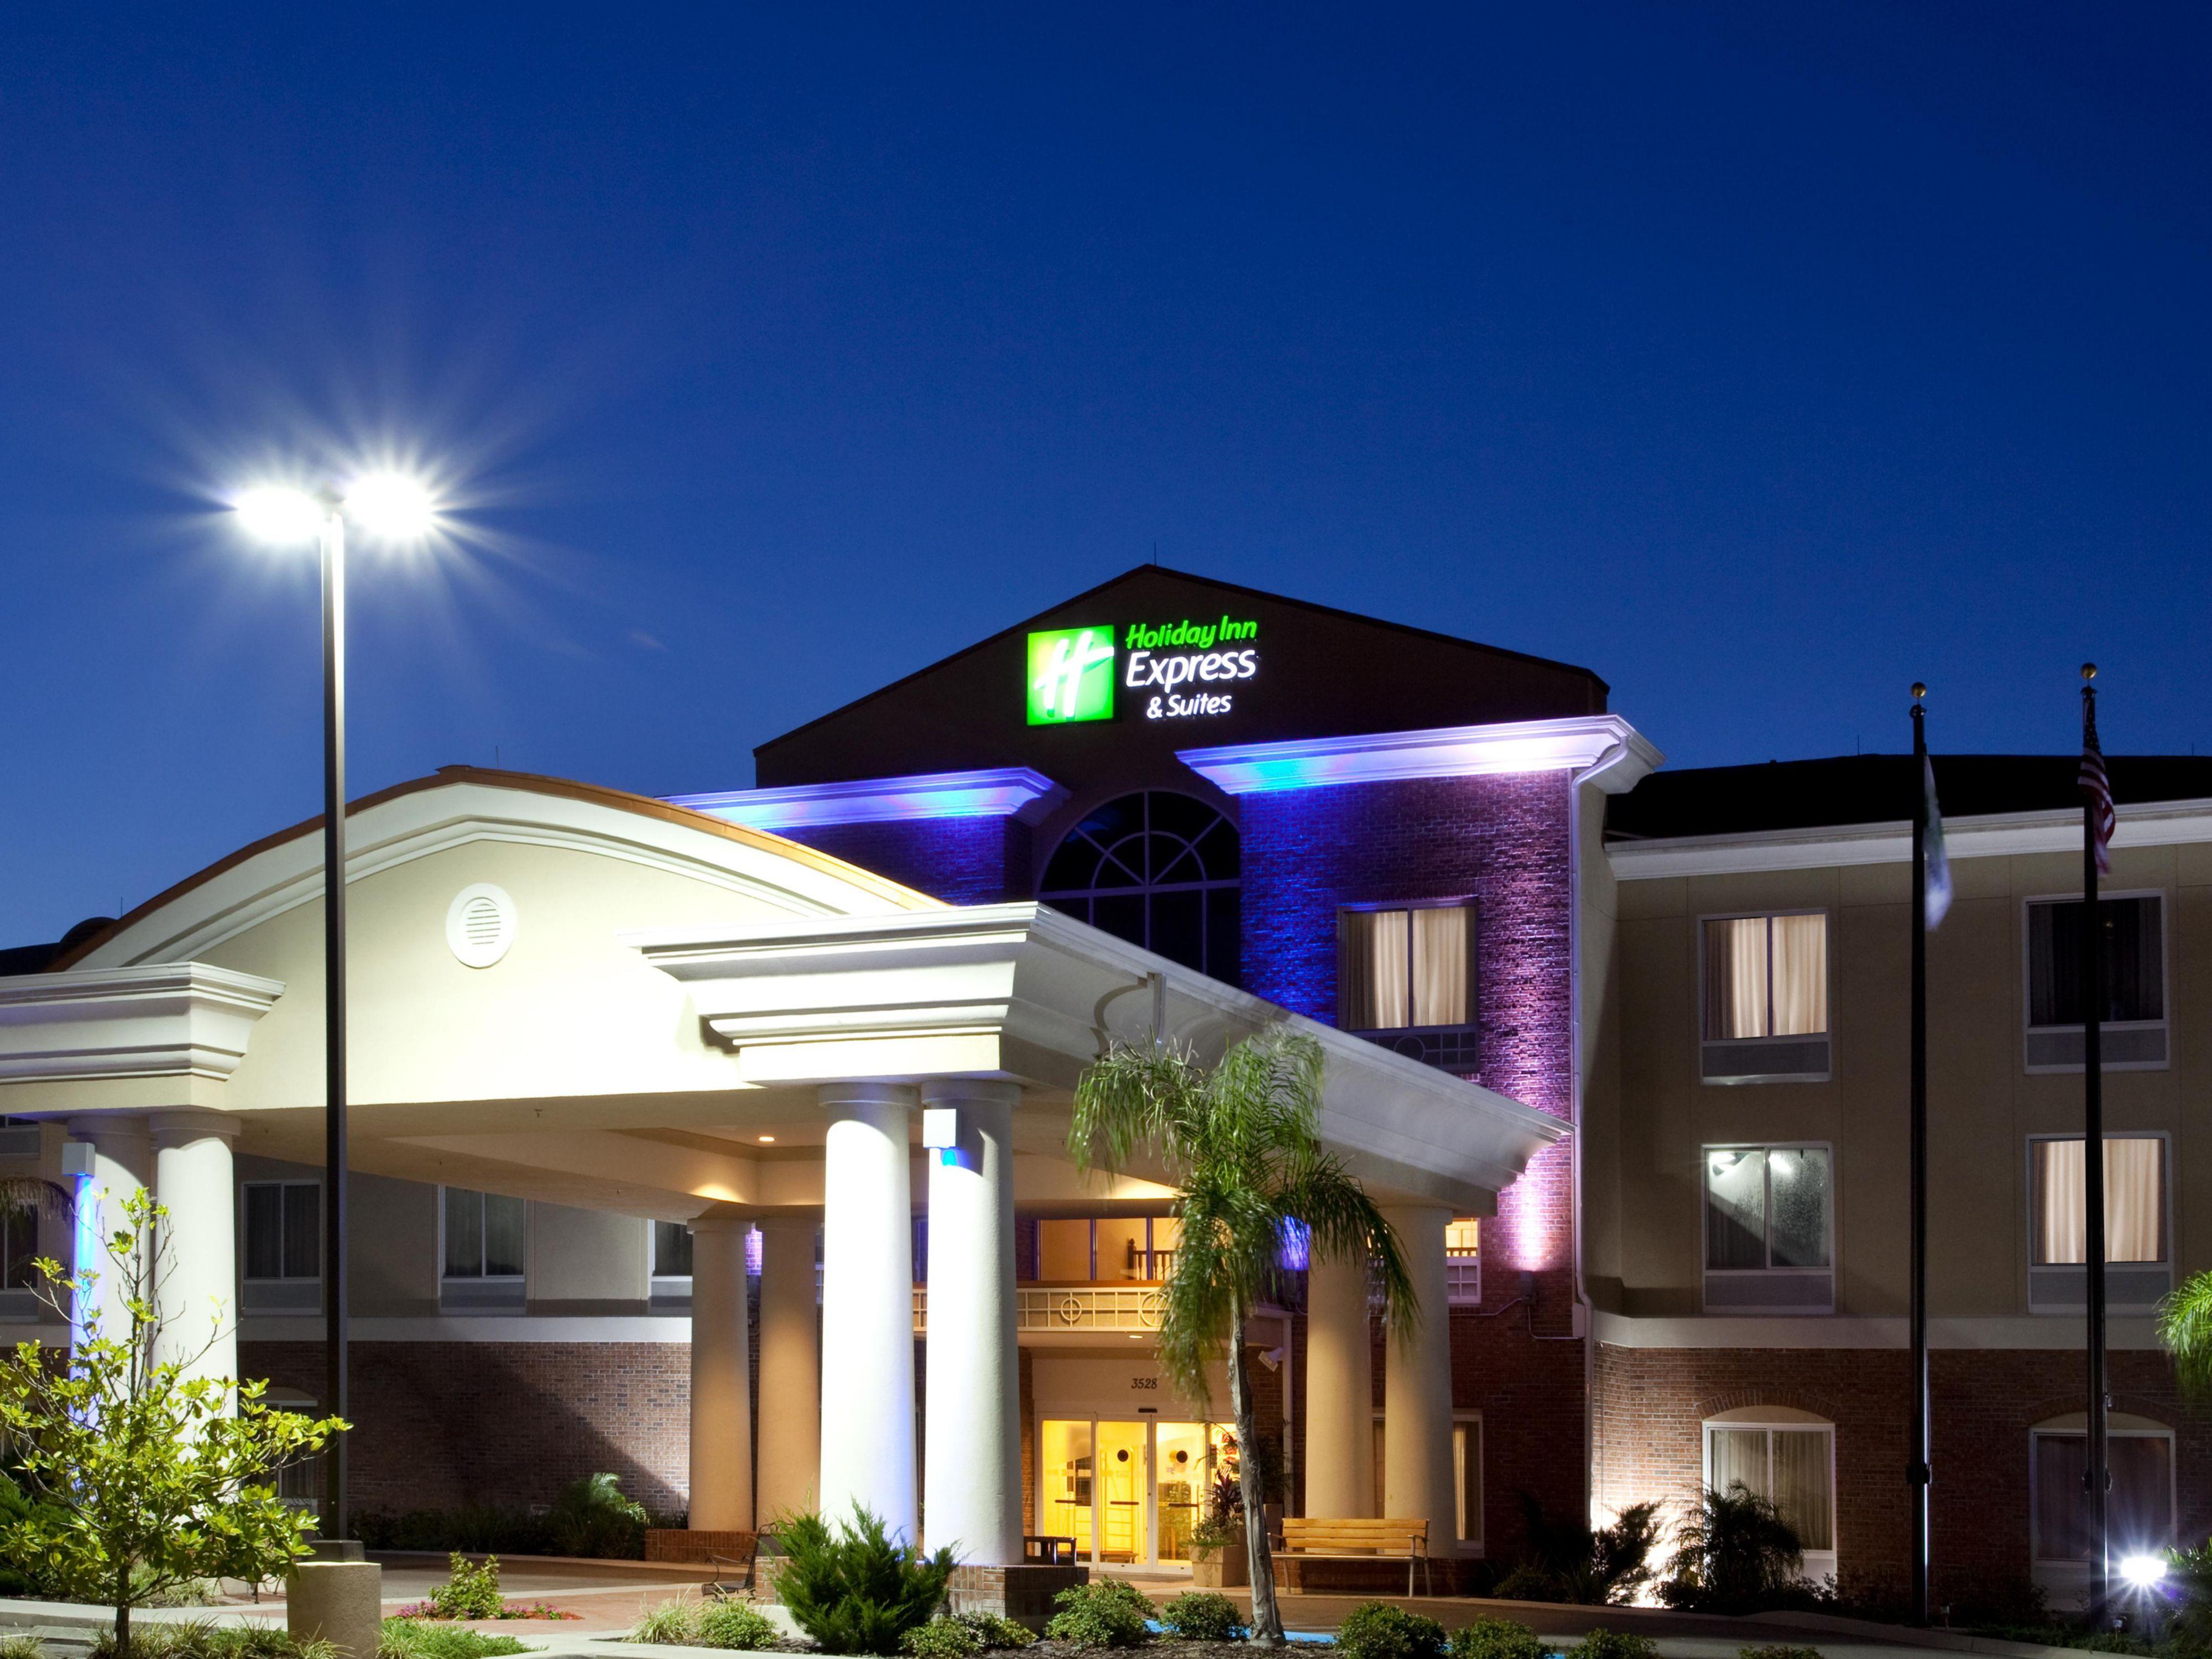 Spring Hill Florida Christmas 2020 Events Spring Hill Hotel near Weeki Wachee Springs | Holiday Inn Express